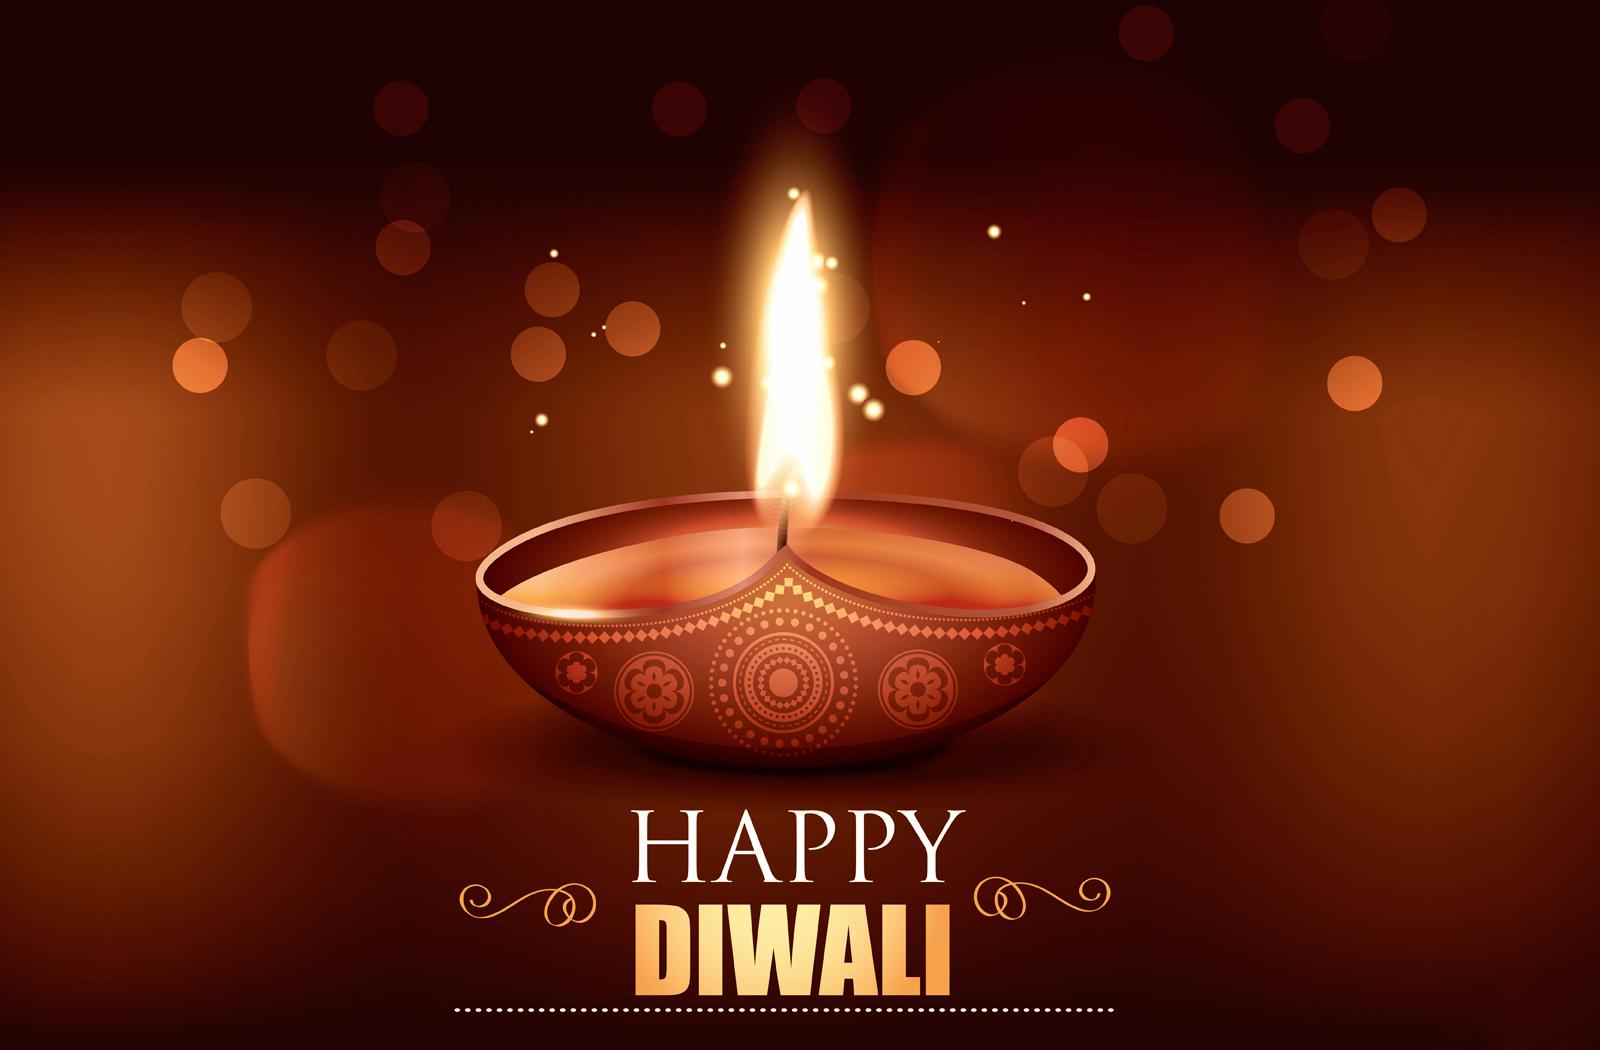 Top 100 Happy Diwali Wishes 2018 In English And Hindi Learnabhi